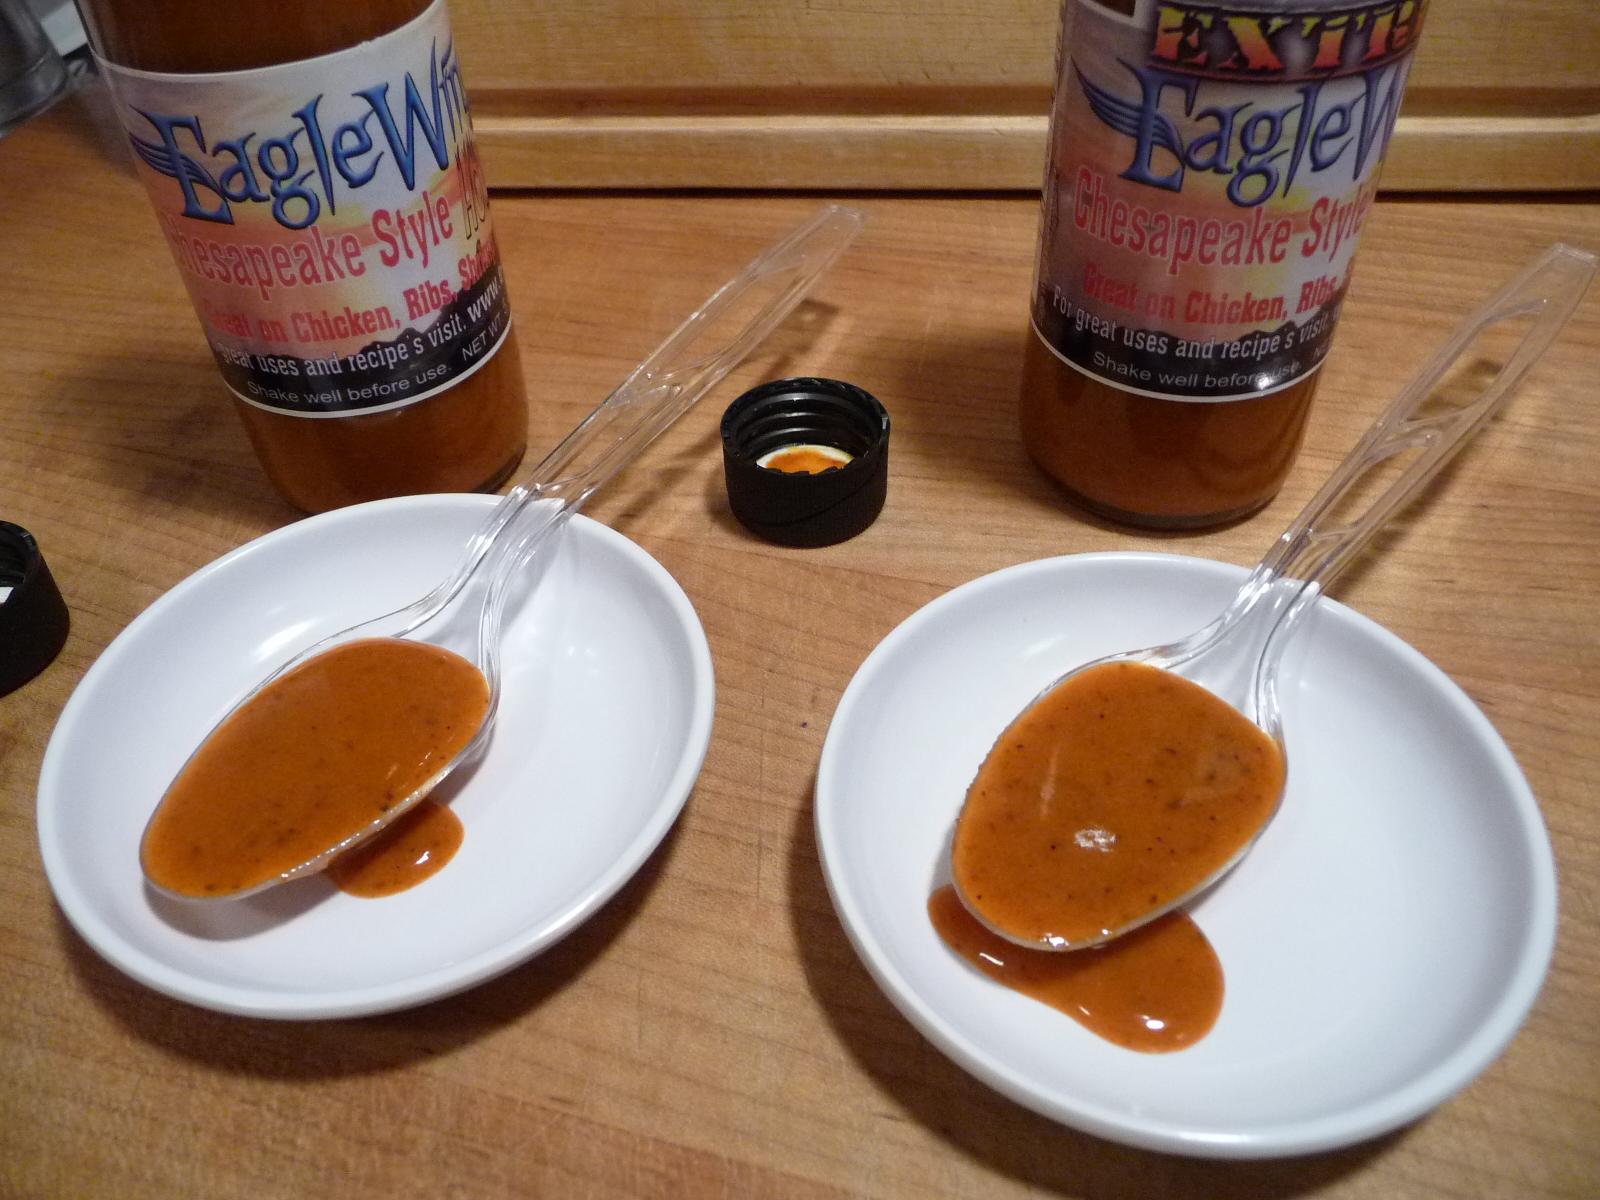 Both sauces